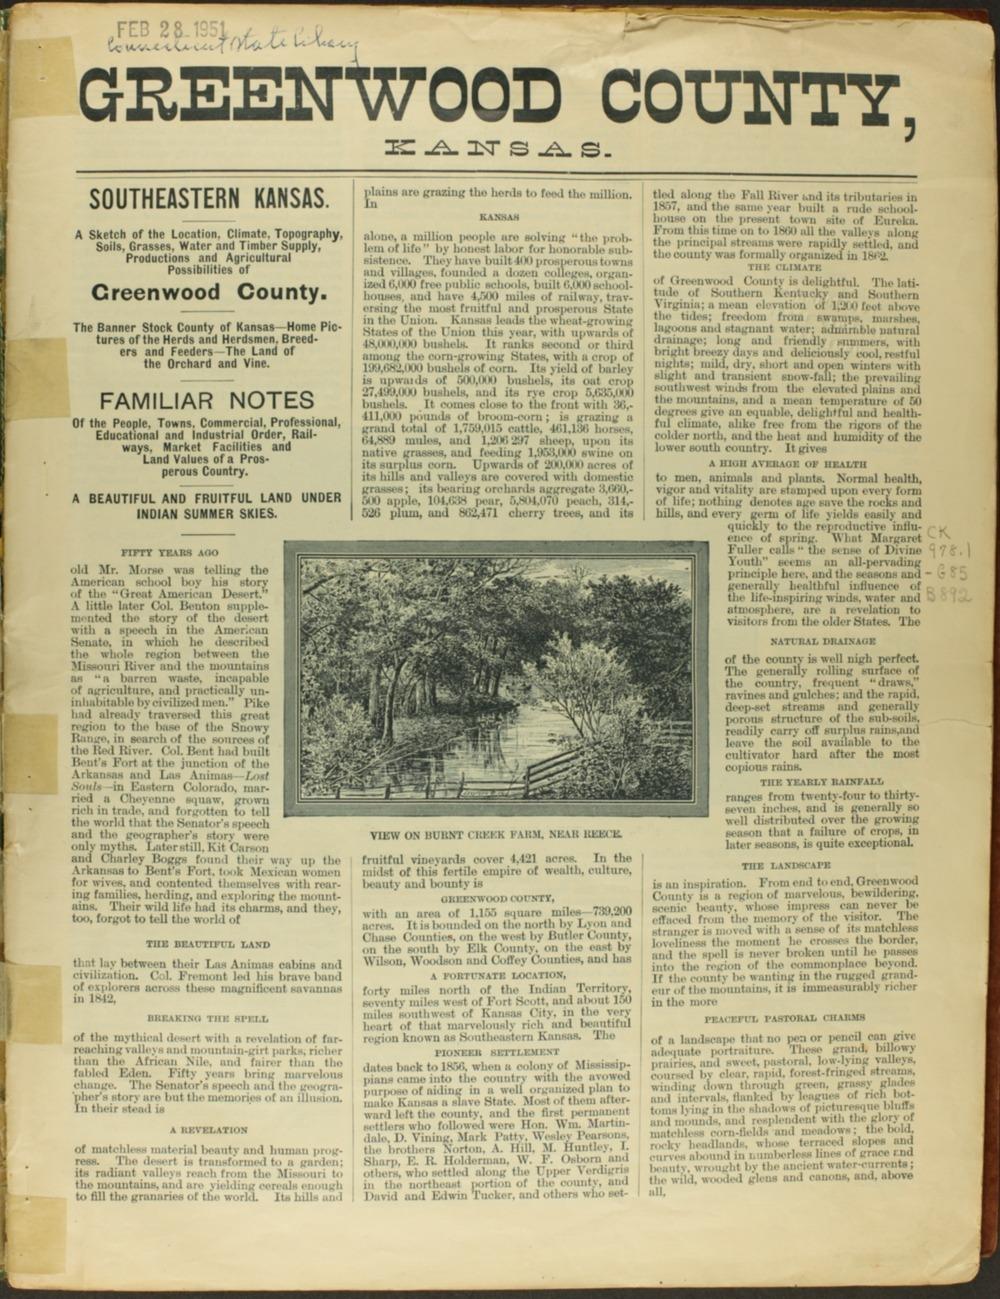 Handbook of Greenwood County, Kansas - 1